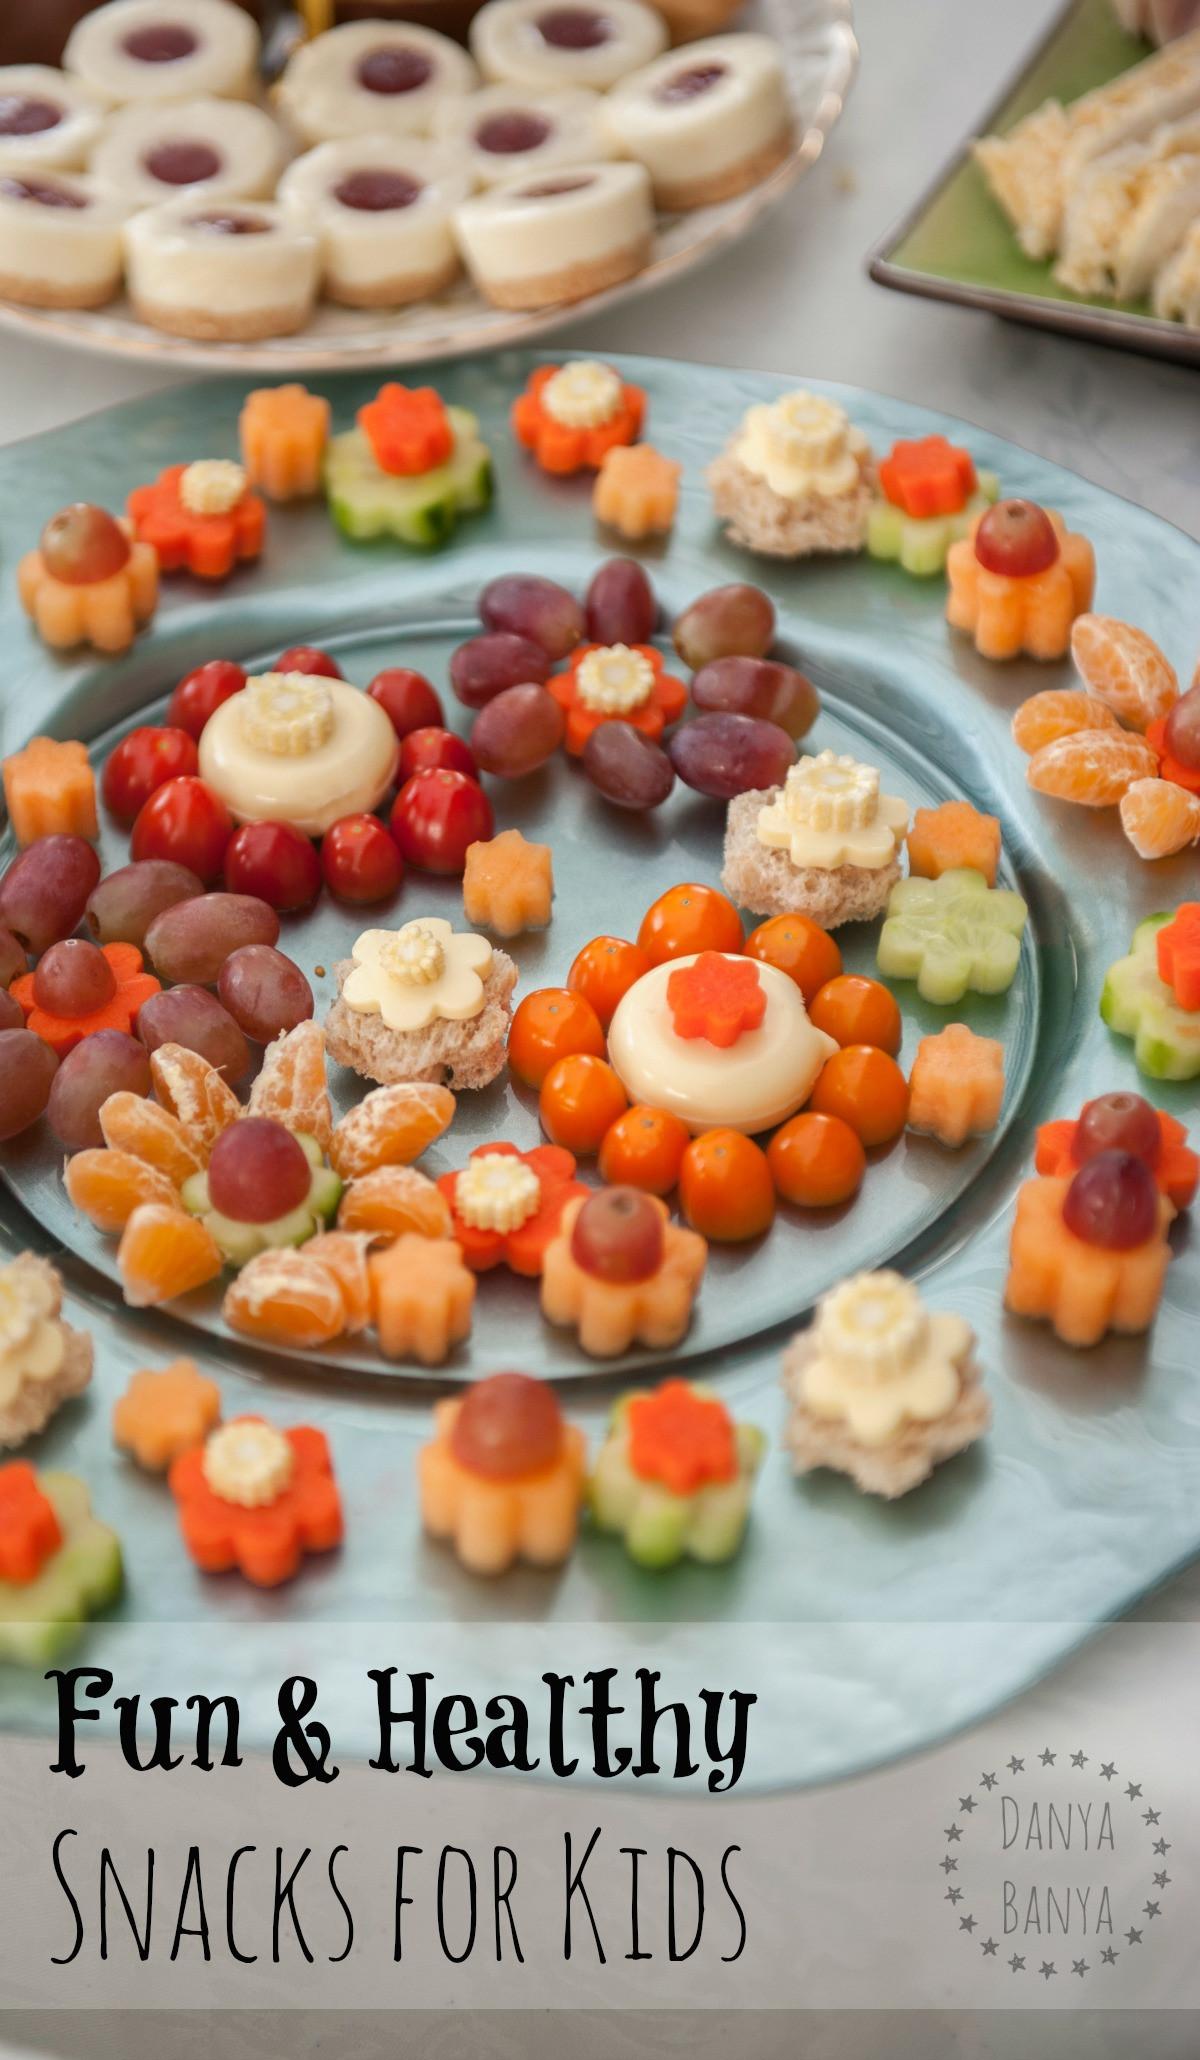 Quick Healthy Snacks For Kids  Fun & Healthy Snacks for Kids – Danya Banya